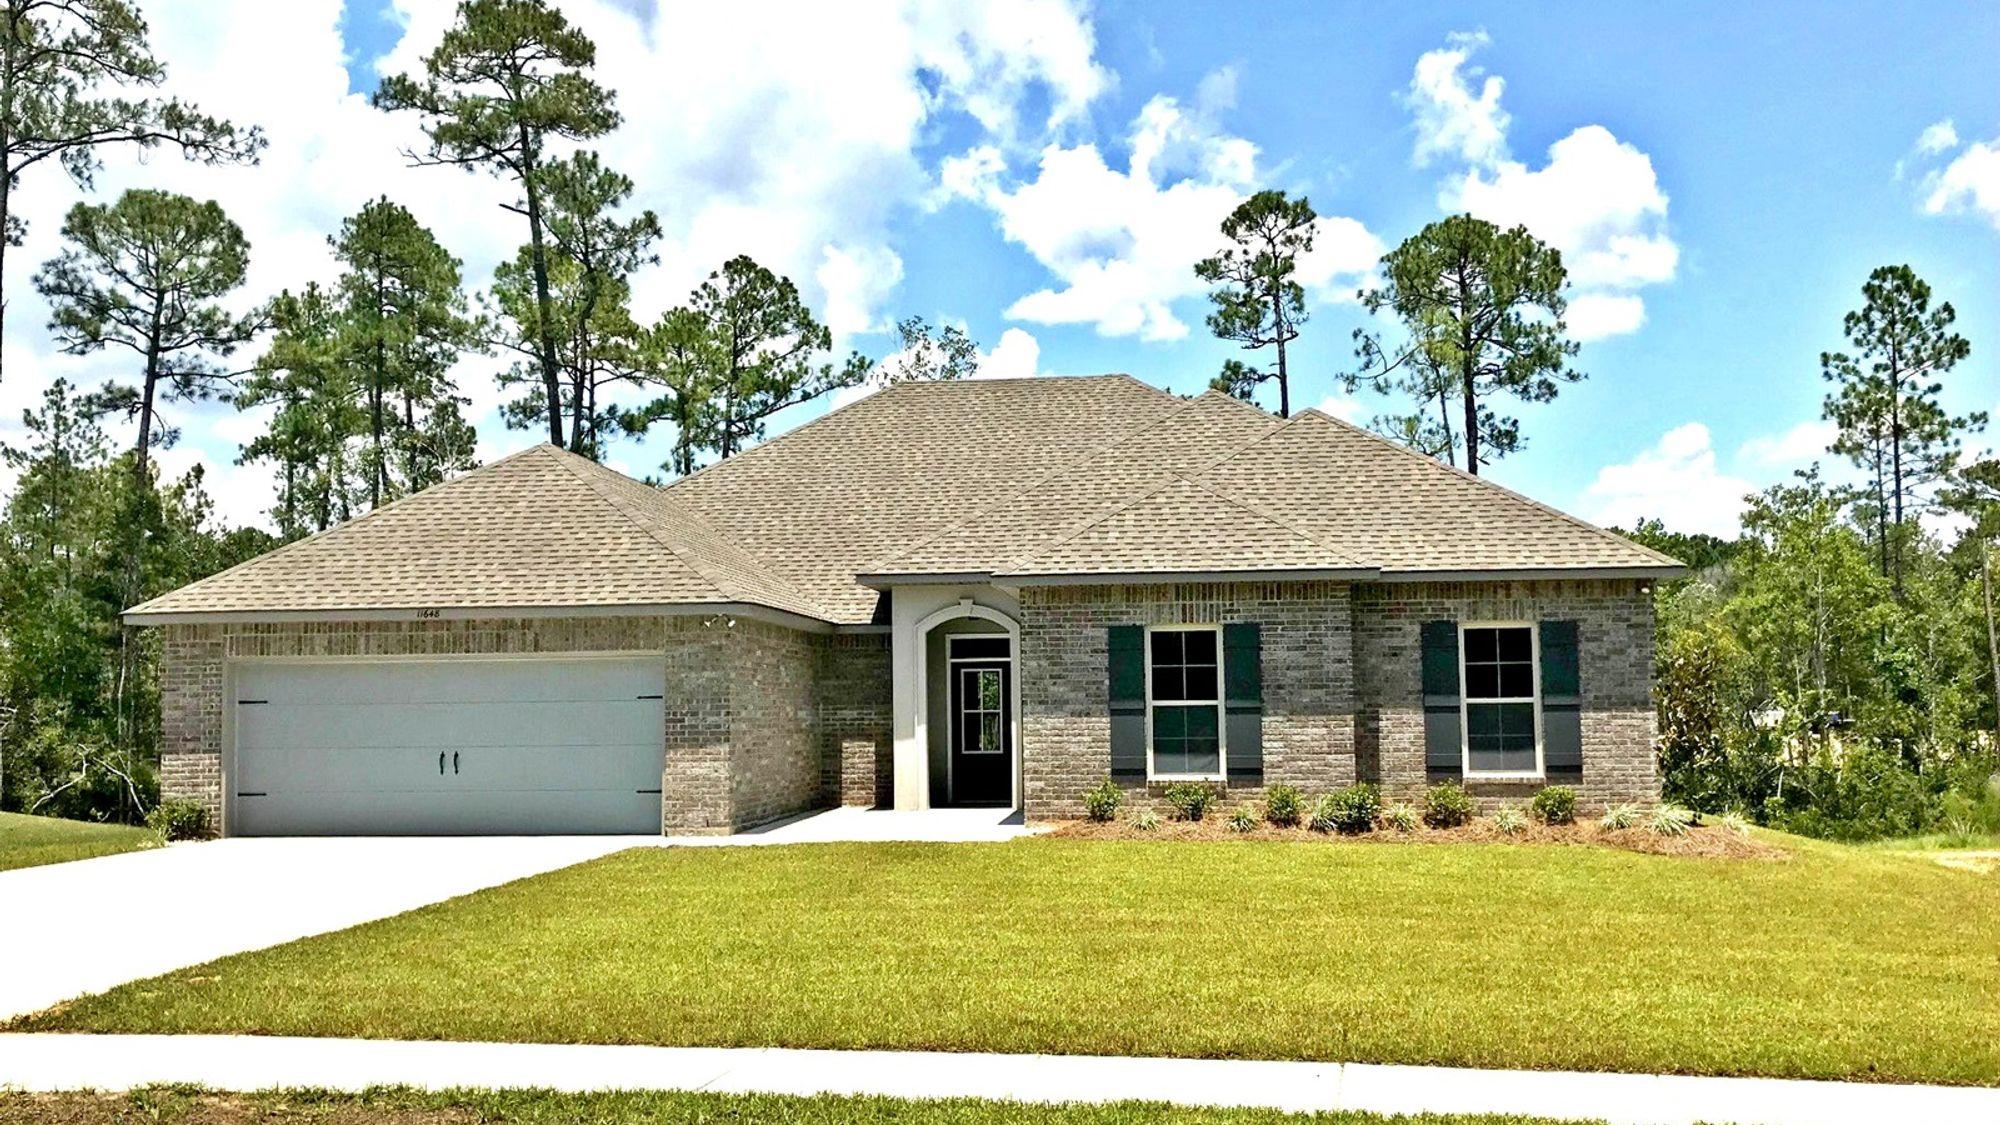 New Homes for Sale in Ocean Springs | DSLD Homes